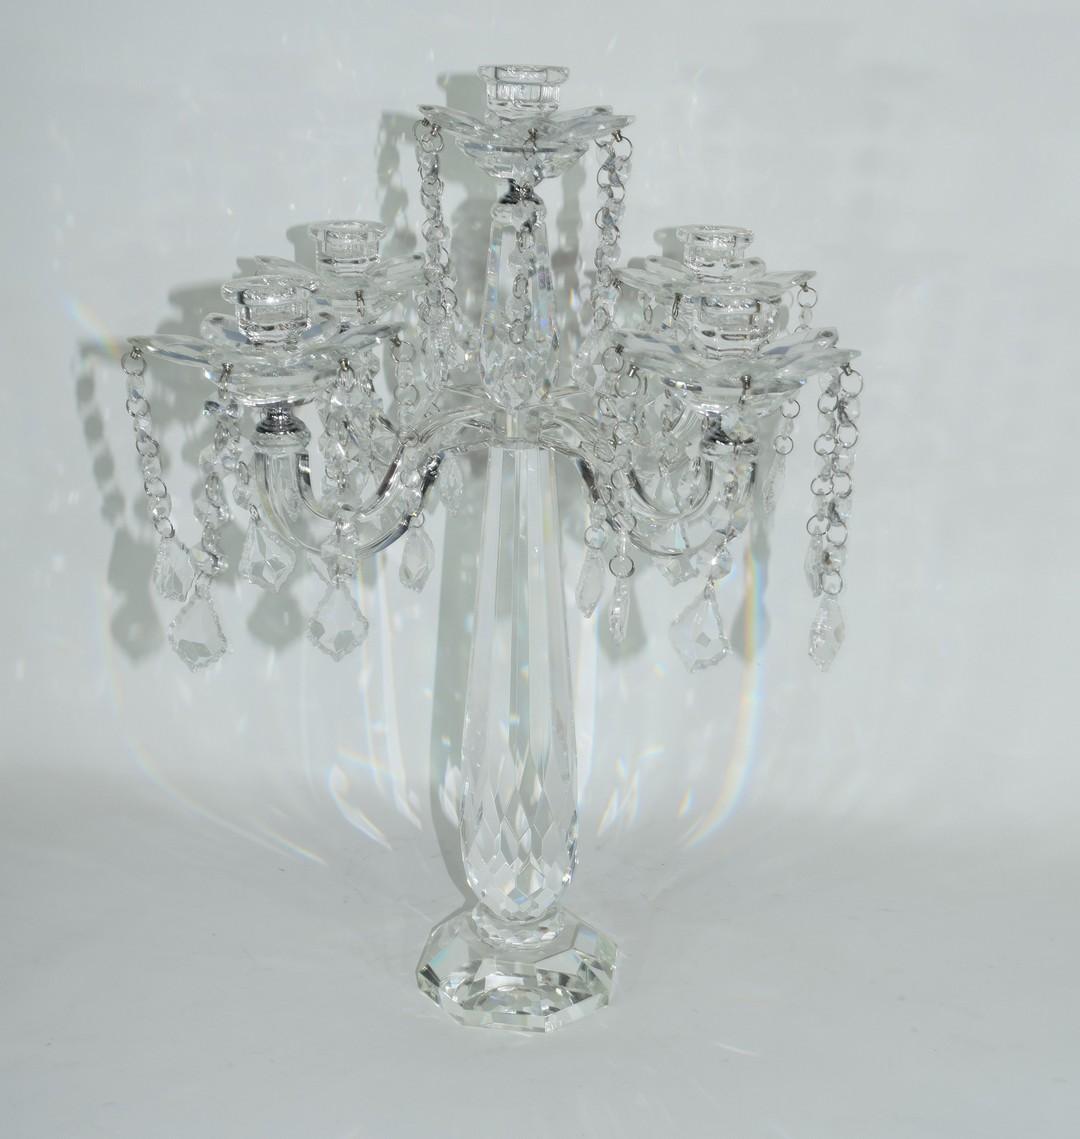 Cut glass candelabra - Image 3 of 3